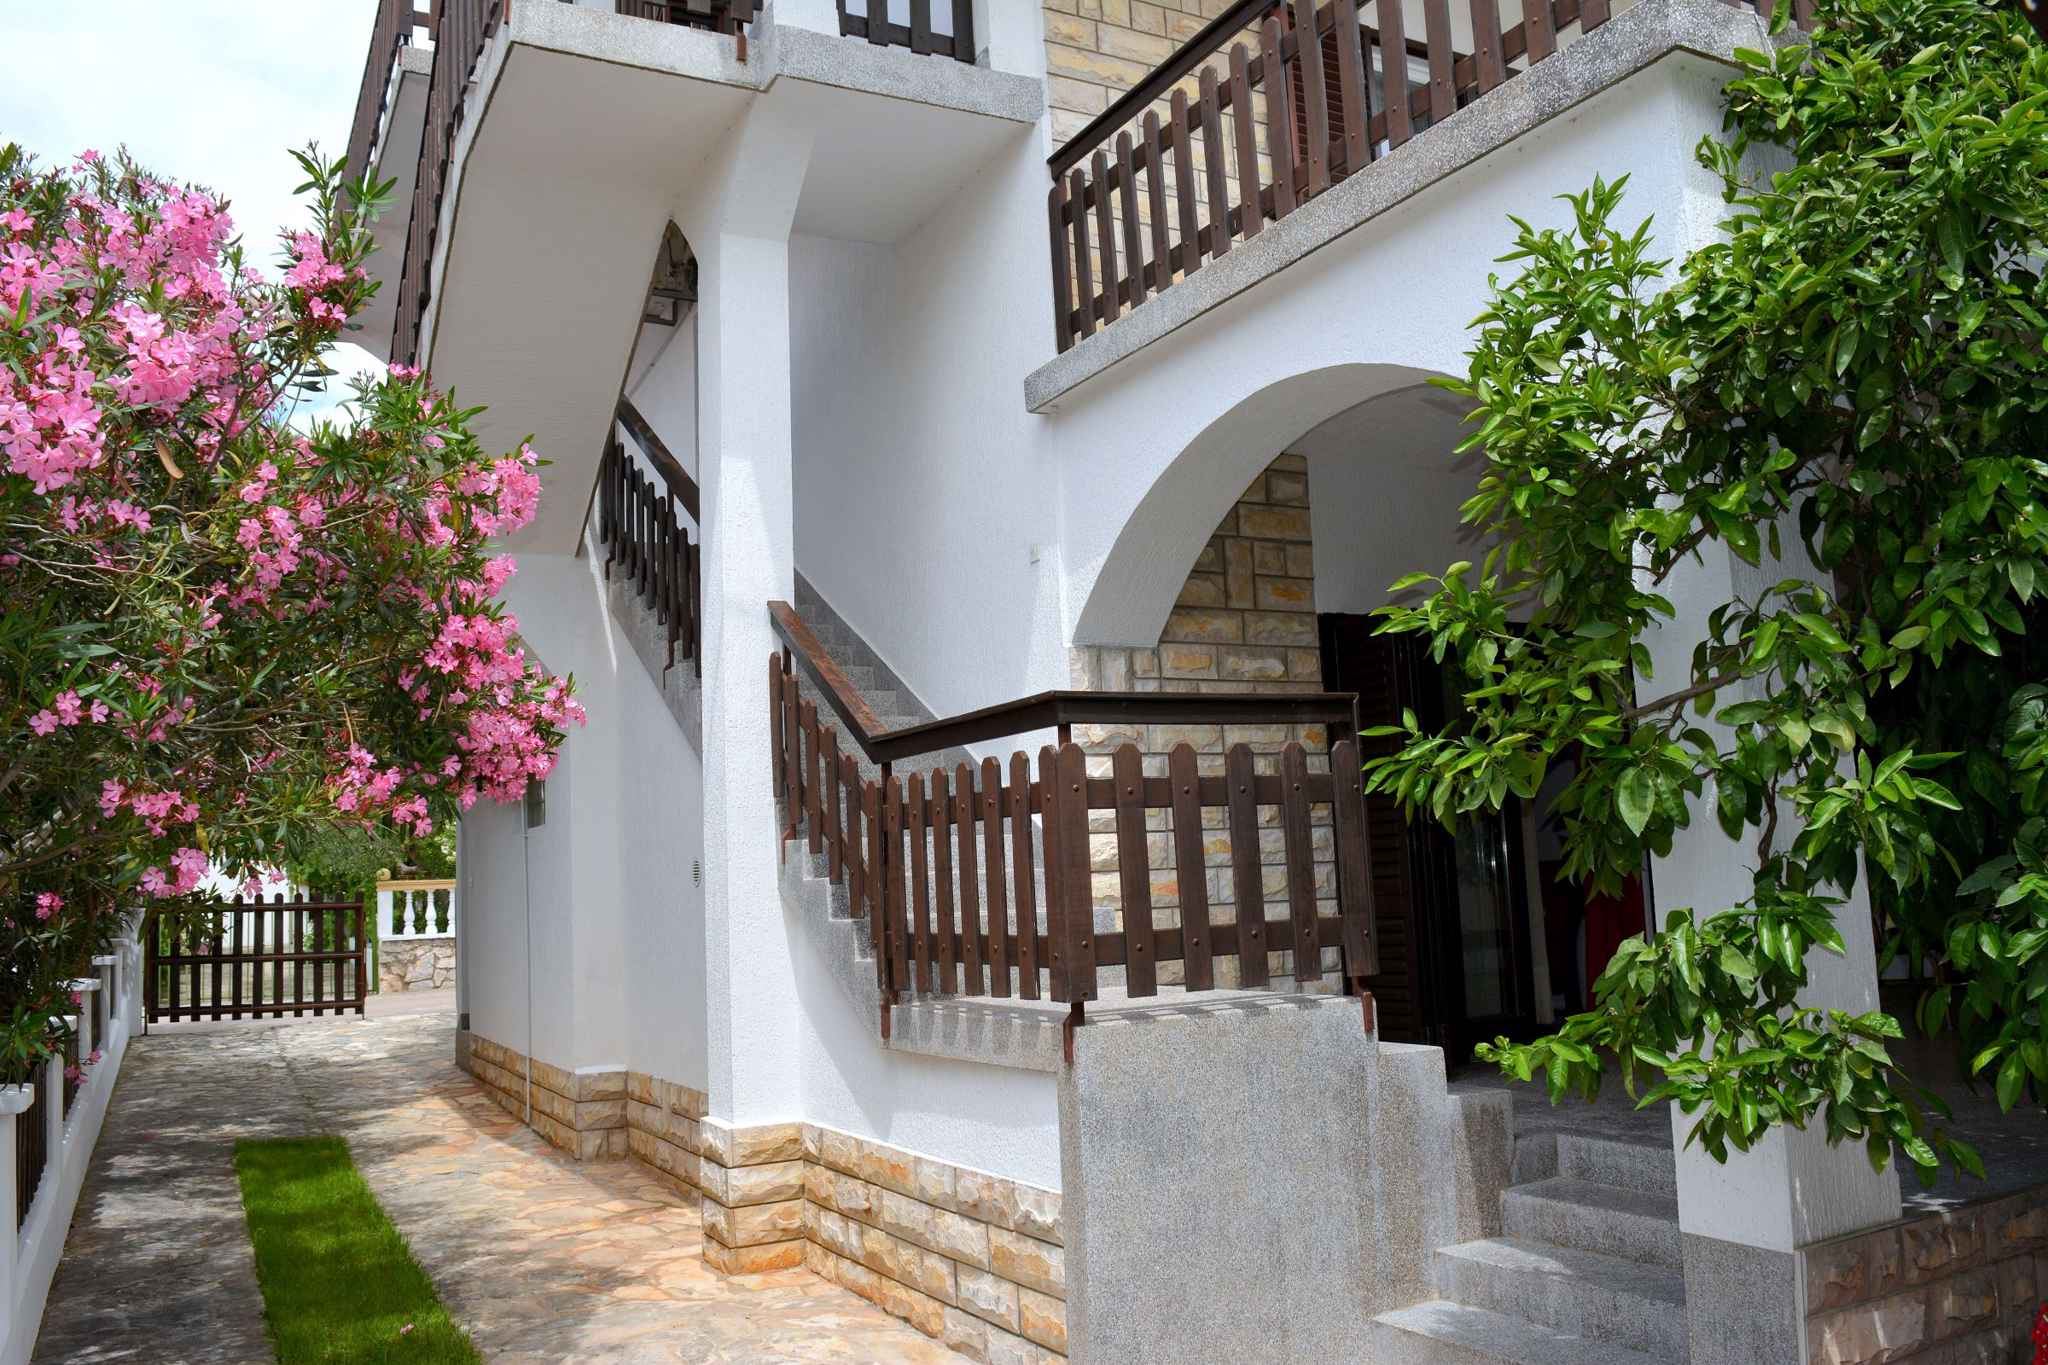 Appartement de vacances mit Terrasse (278776), Vodice, , Dalmatie, Croatie, image 2